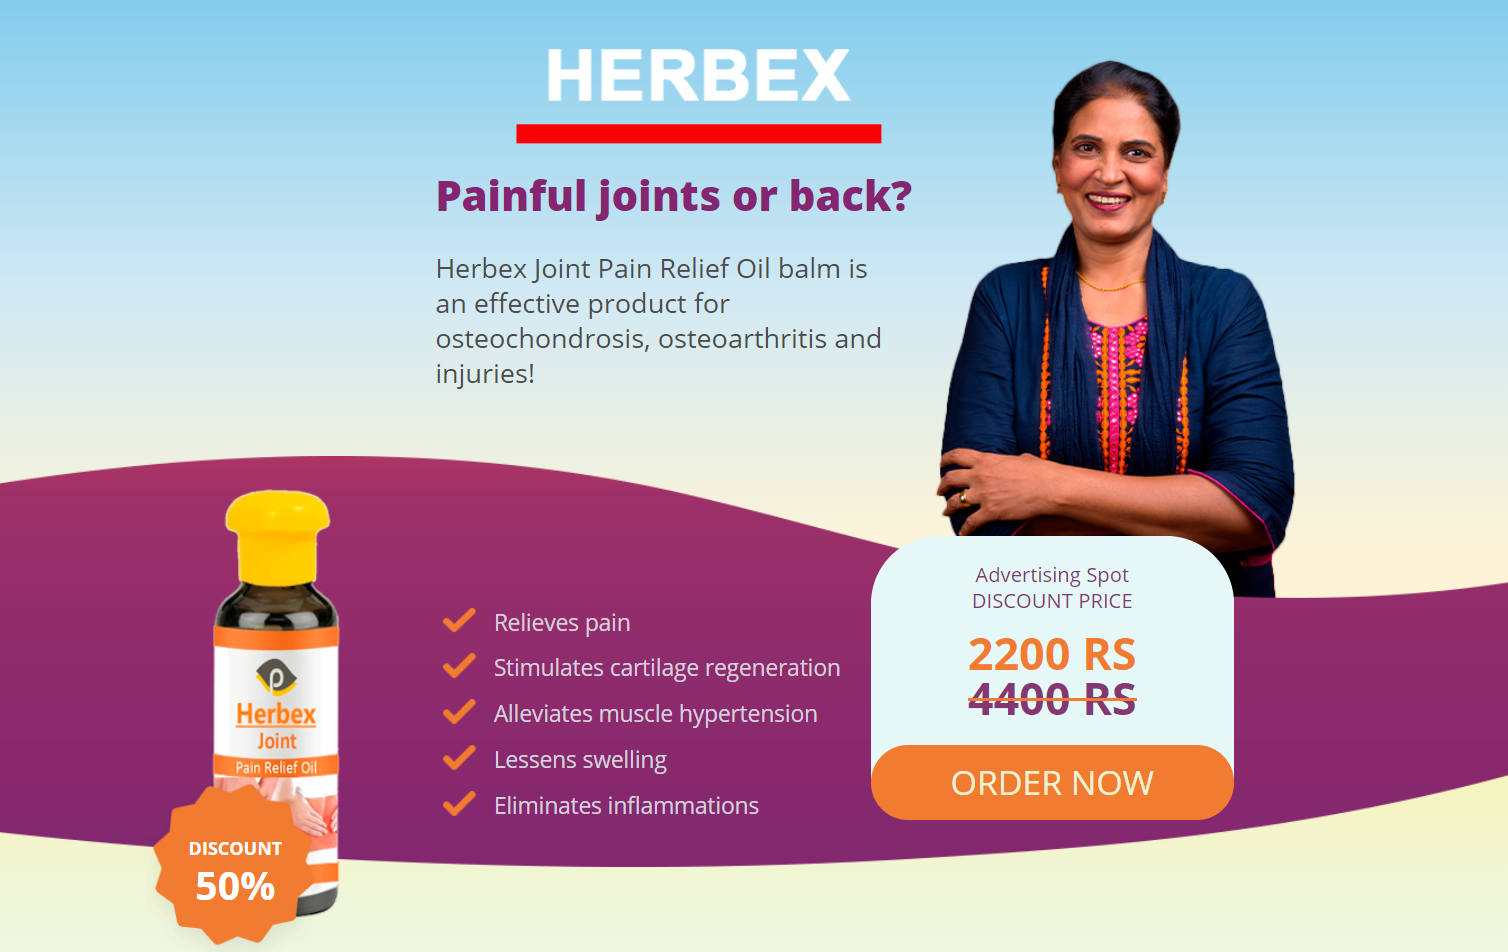 Herbex Joint